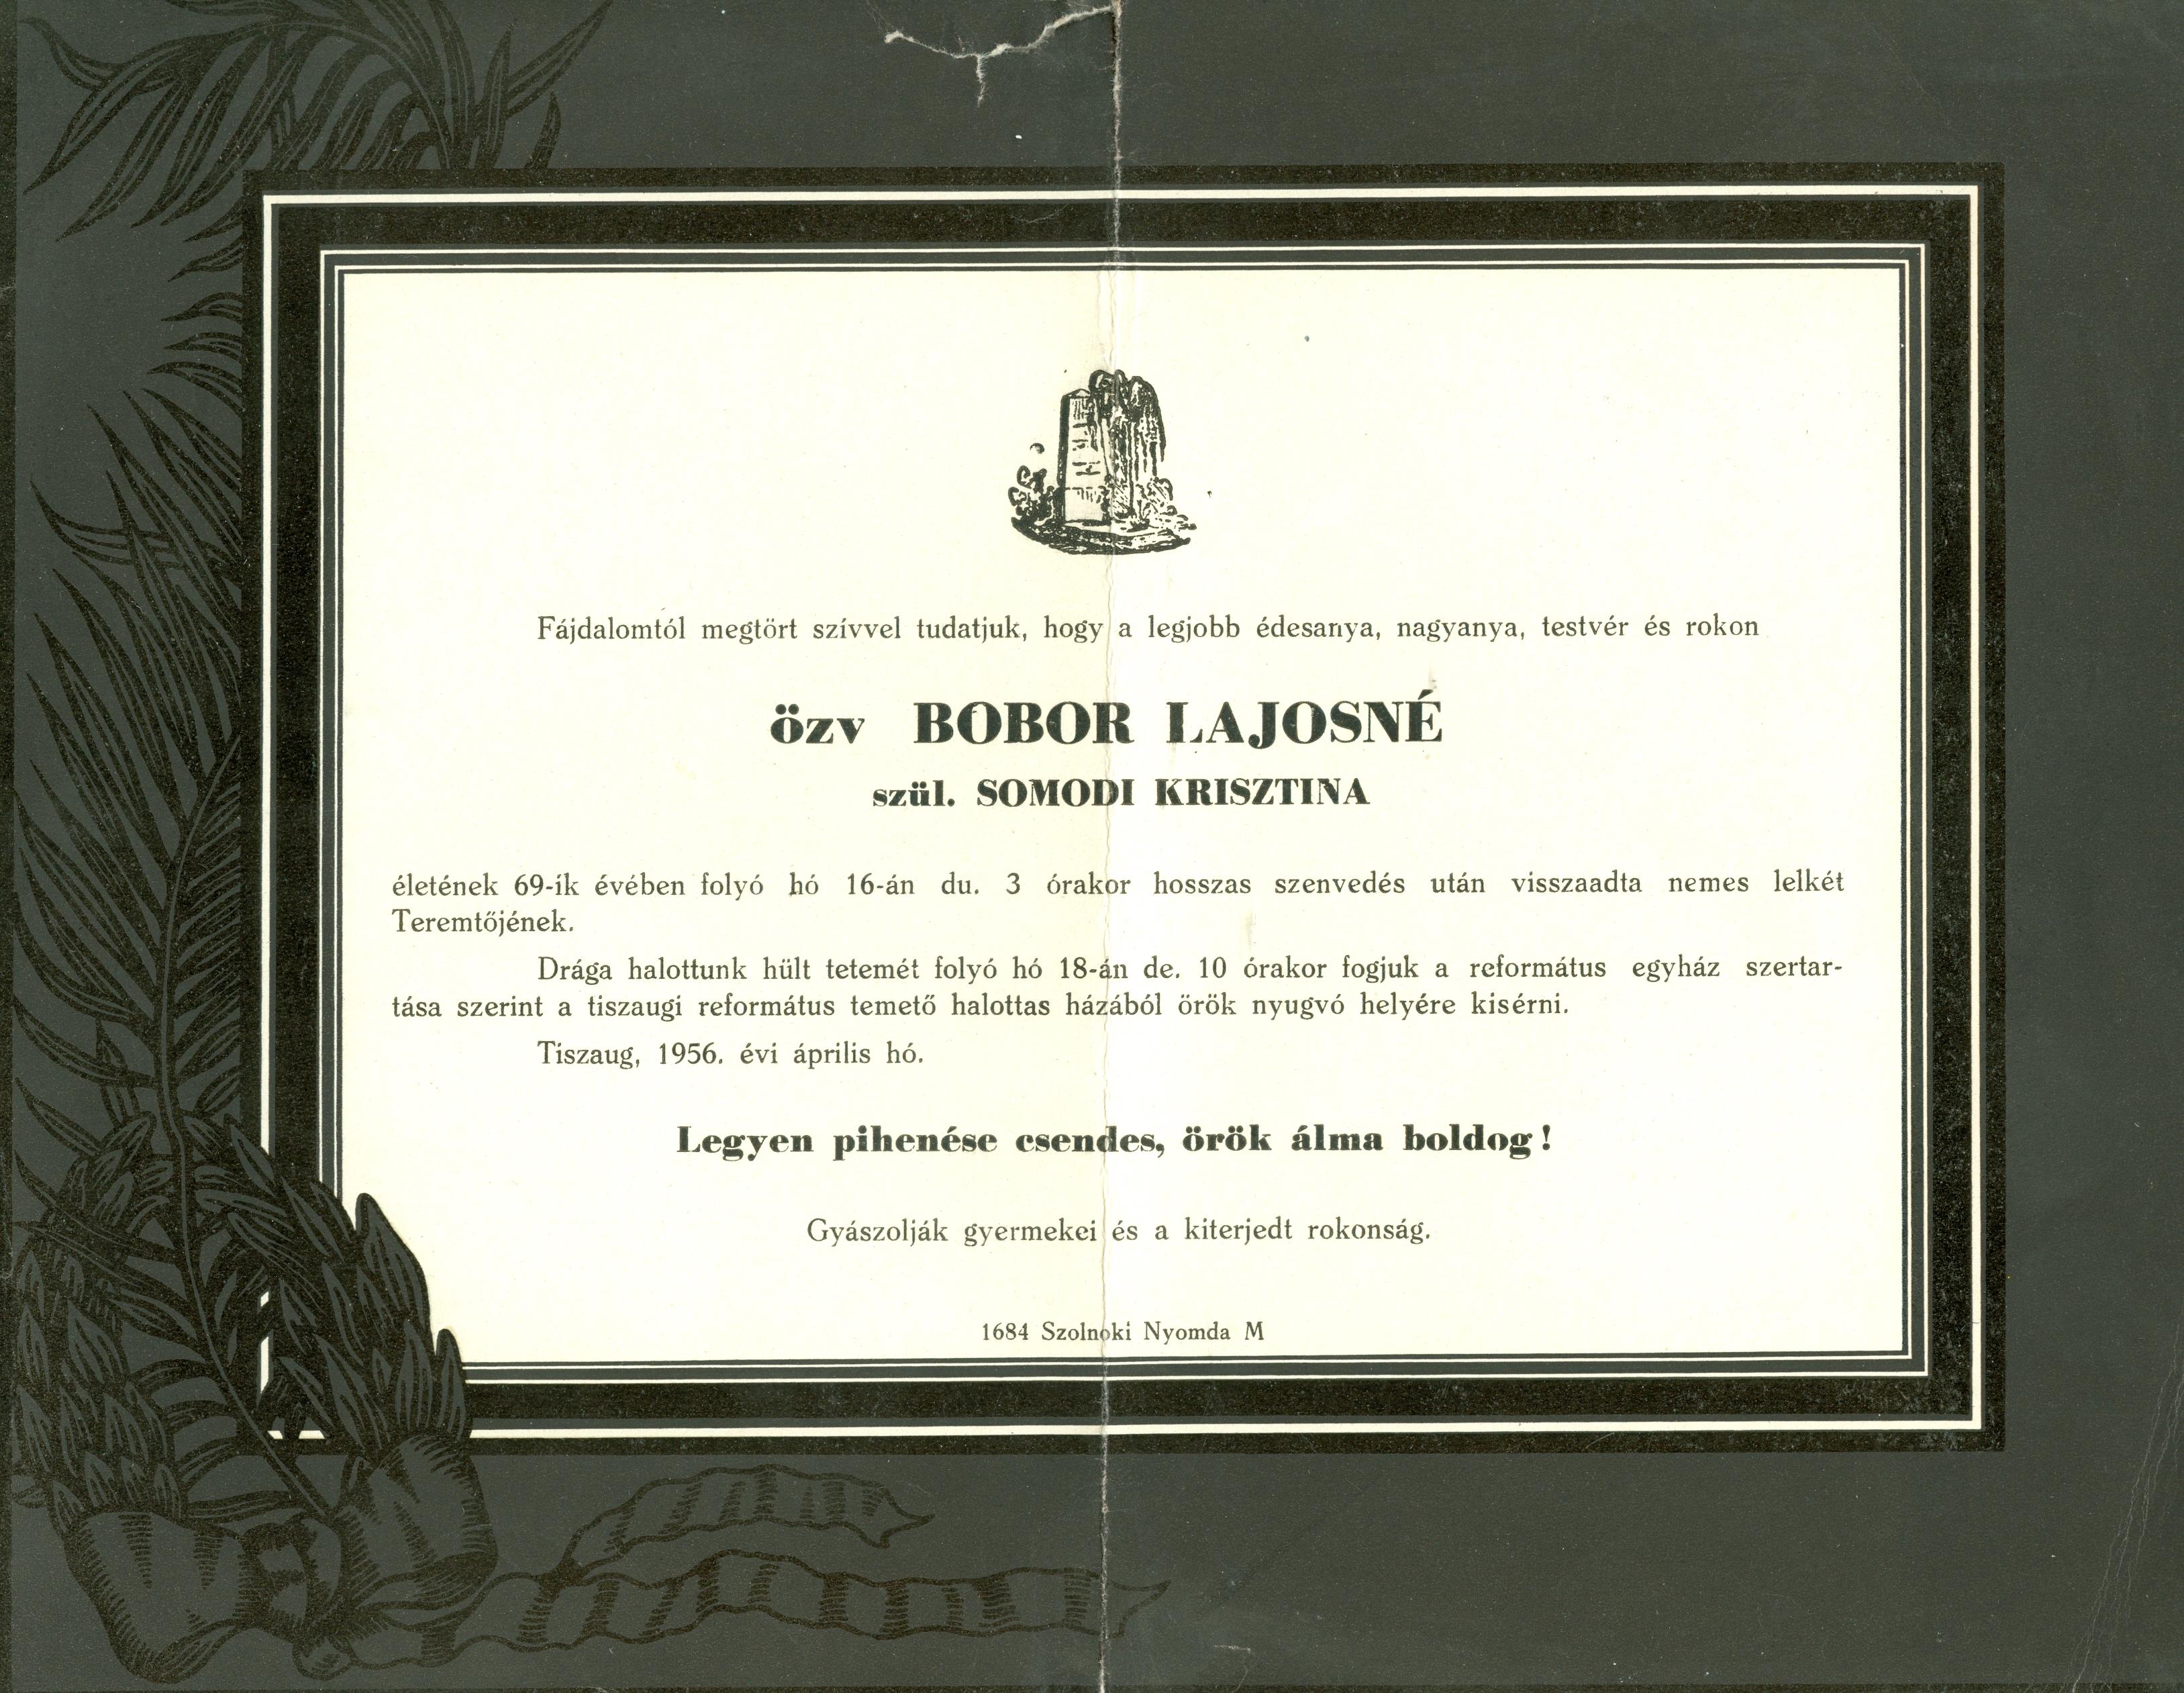 Bobor Lajosné Somodi Krisztina